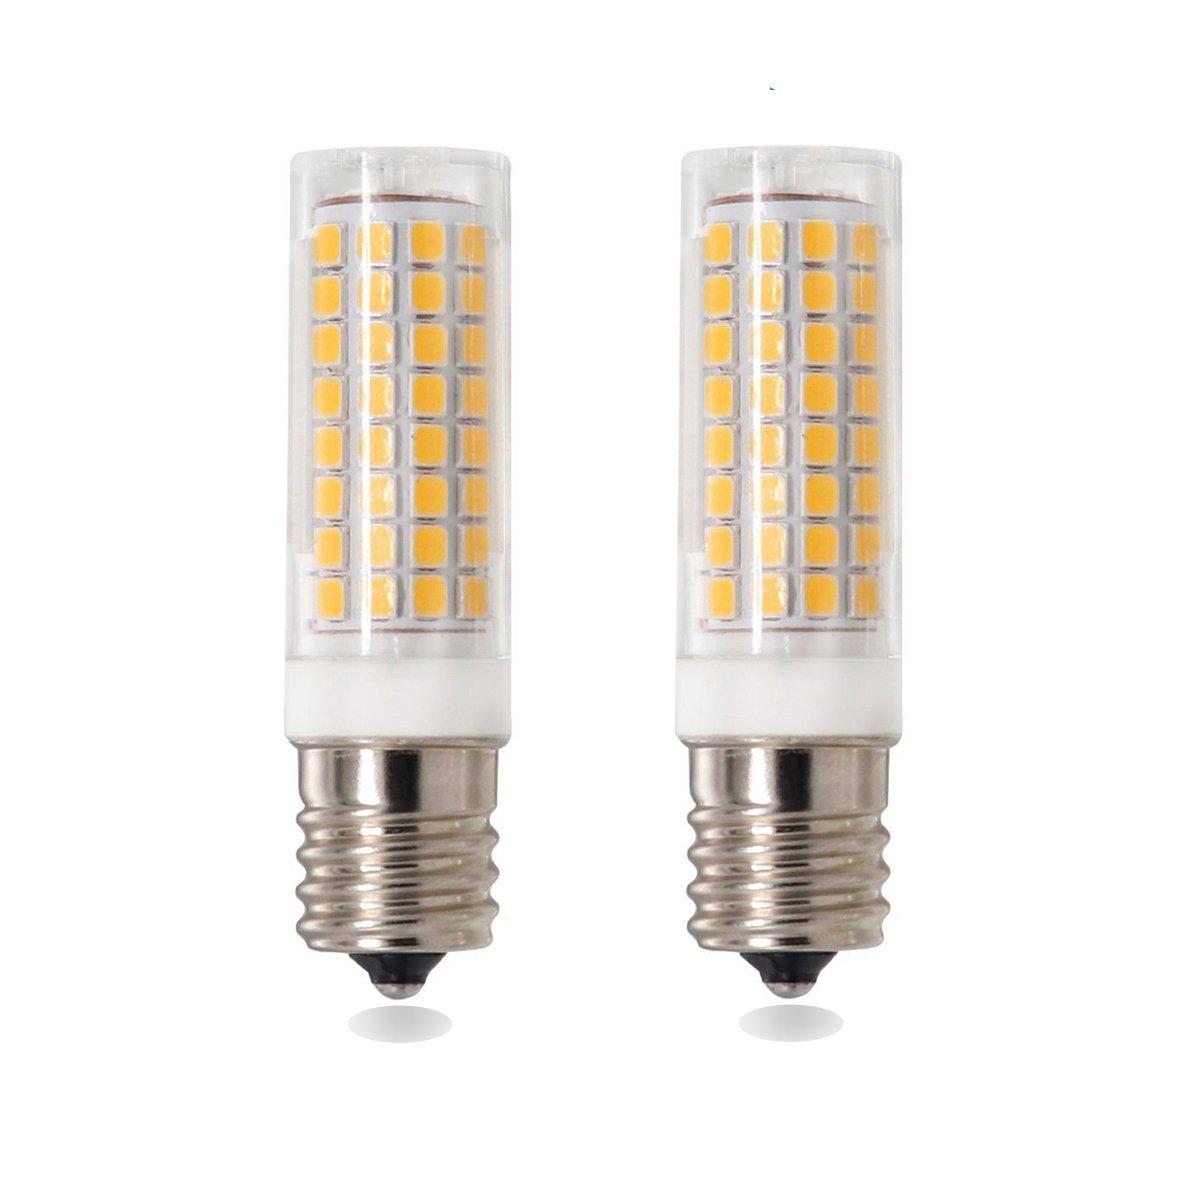 E17 LED Bulb, Intermidate Base, Dimmable E17 LED for Microwave Oven Light, 7Watt Appliance Bulb, 730lm, 75W Halogen Bulbs Equivalent, AC110-120V, 2-Pack (E17-7W-Warm White)